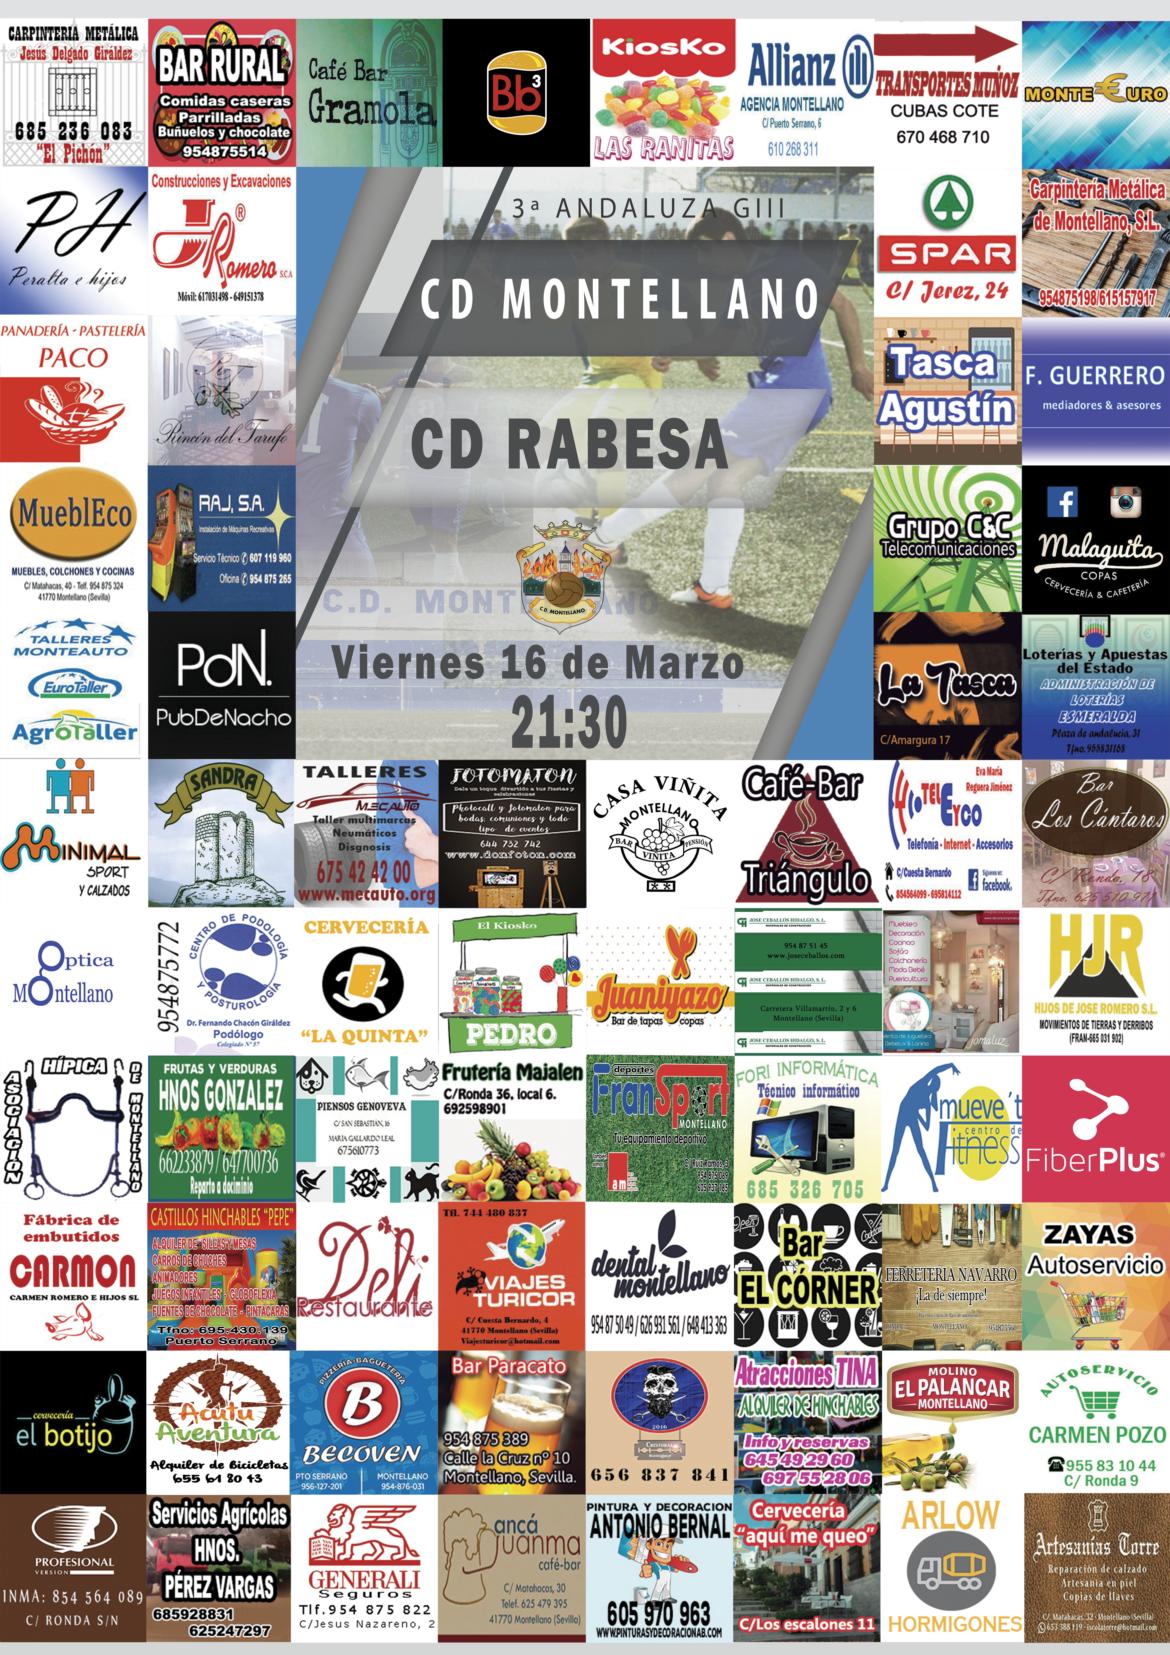 Cartel-CD-Montellano-vs-CD-Rabesa-v2